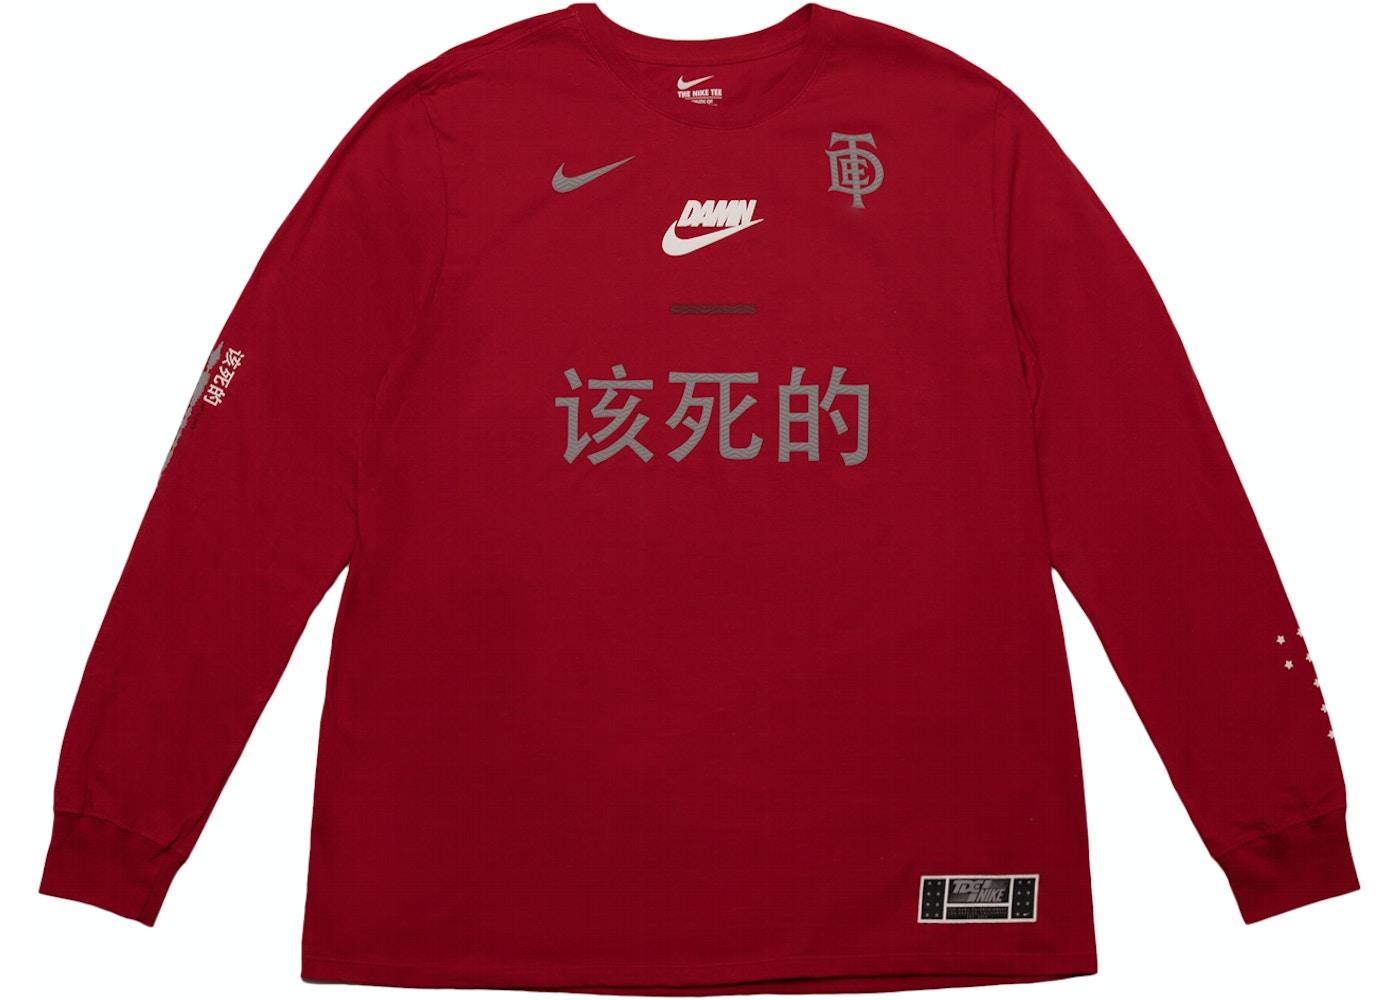 TDE x Nike Swoosh Long Sleeve TDE Red - SS18 0c4721a68